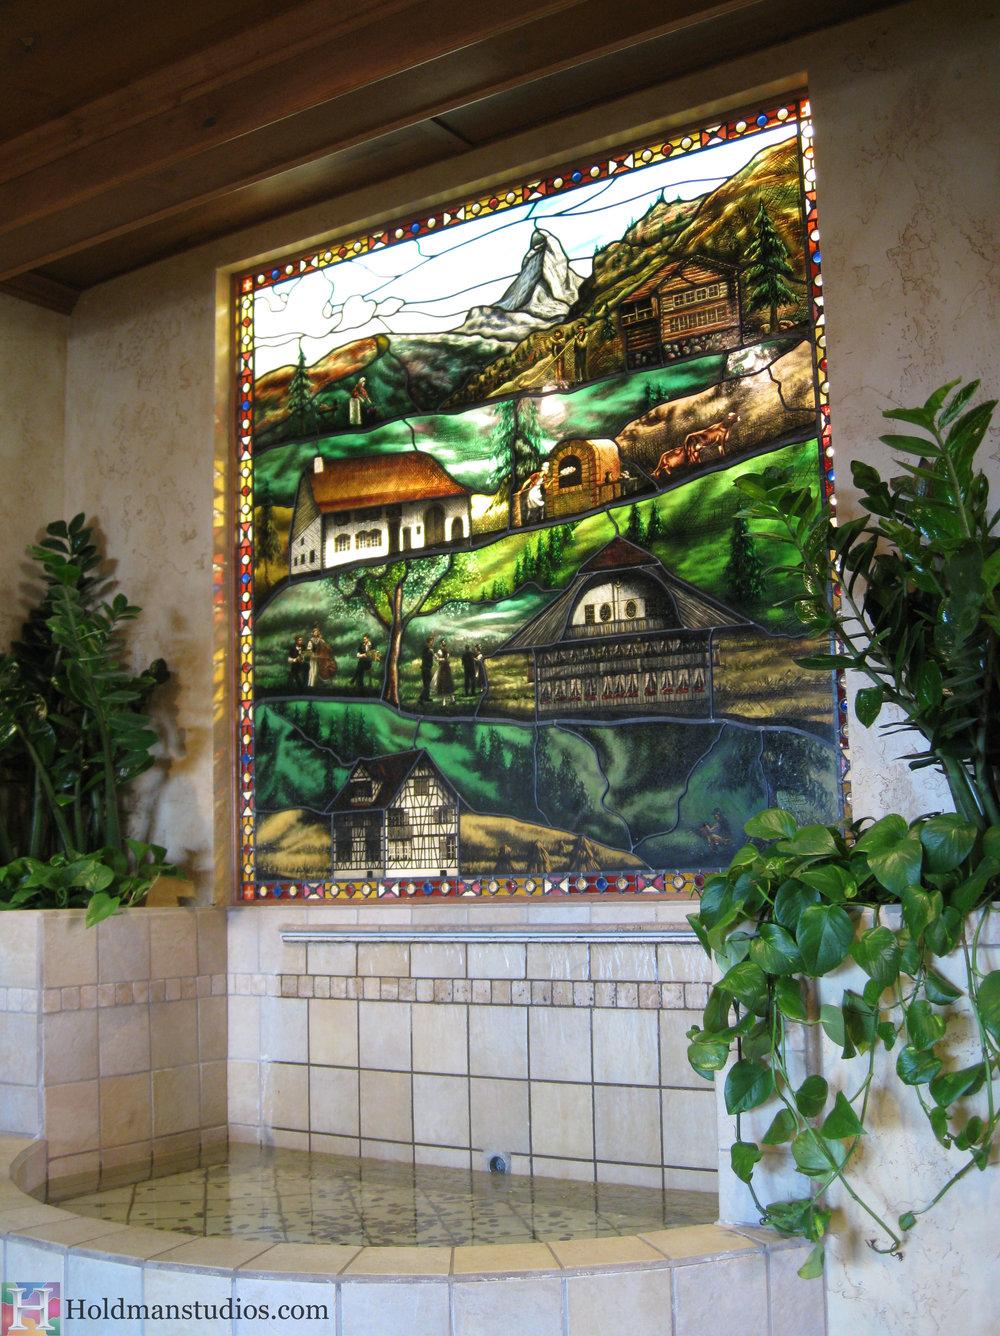 Holdman-studios-stained-glass-fountain-window-zermatt-resort-swiss-heritage.jpg